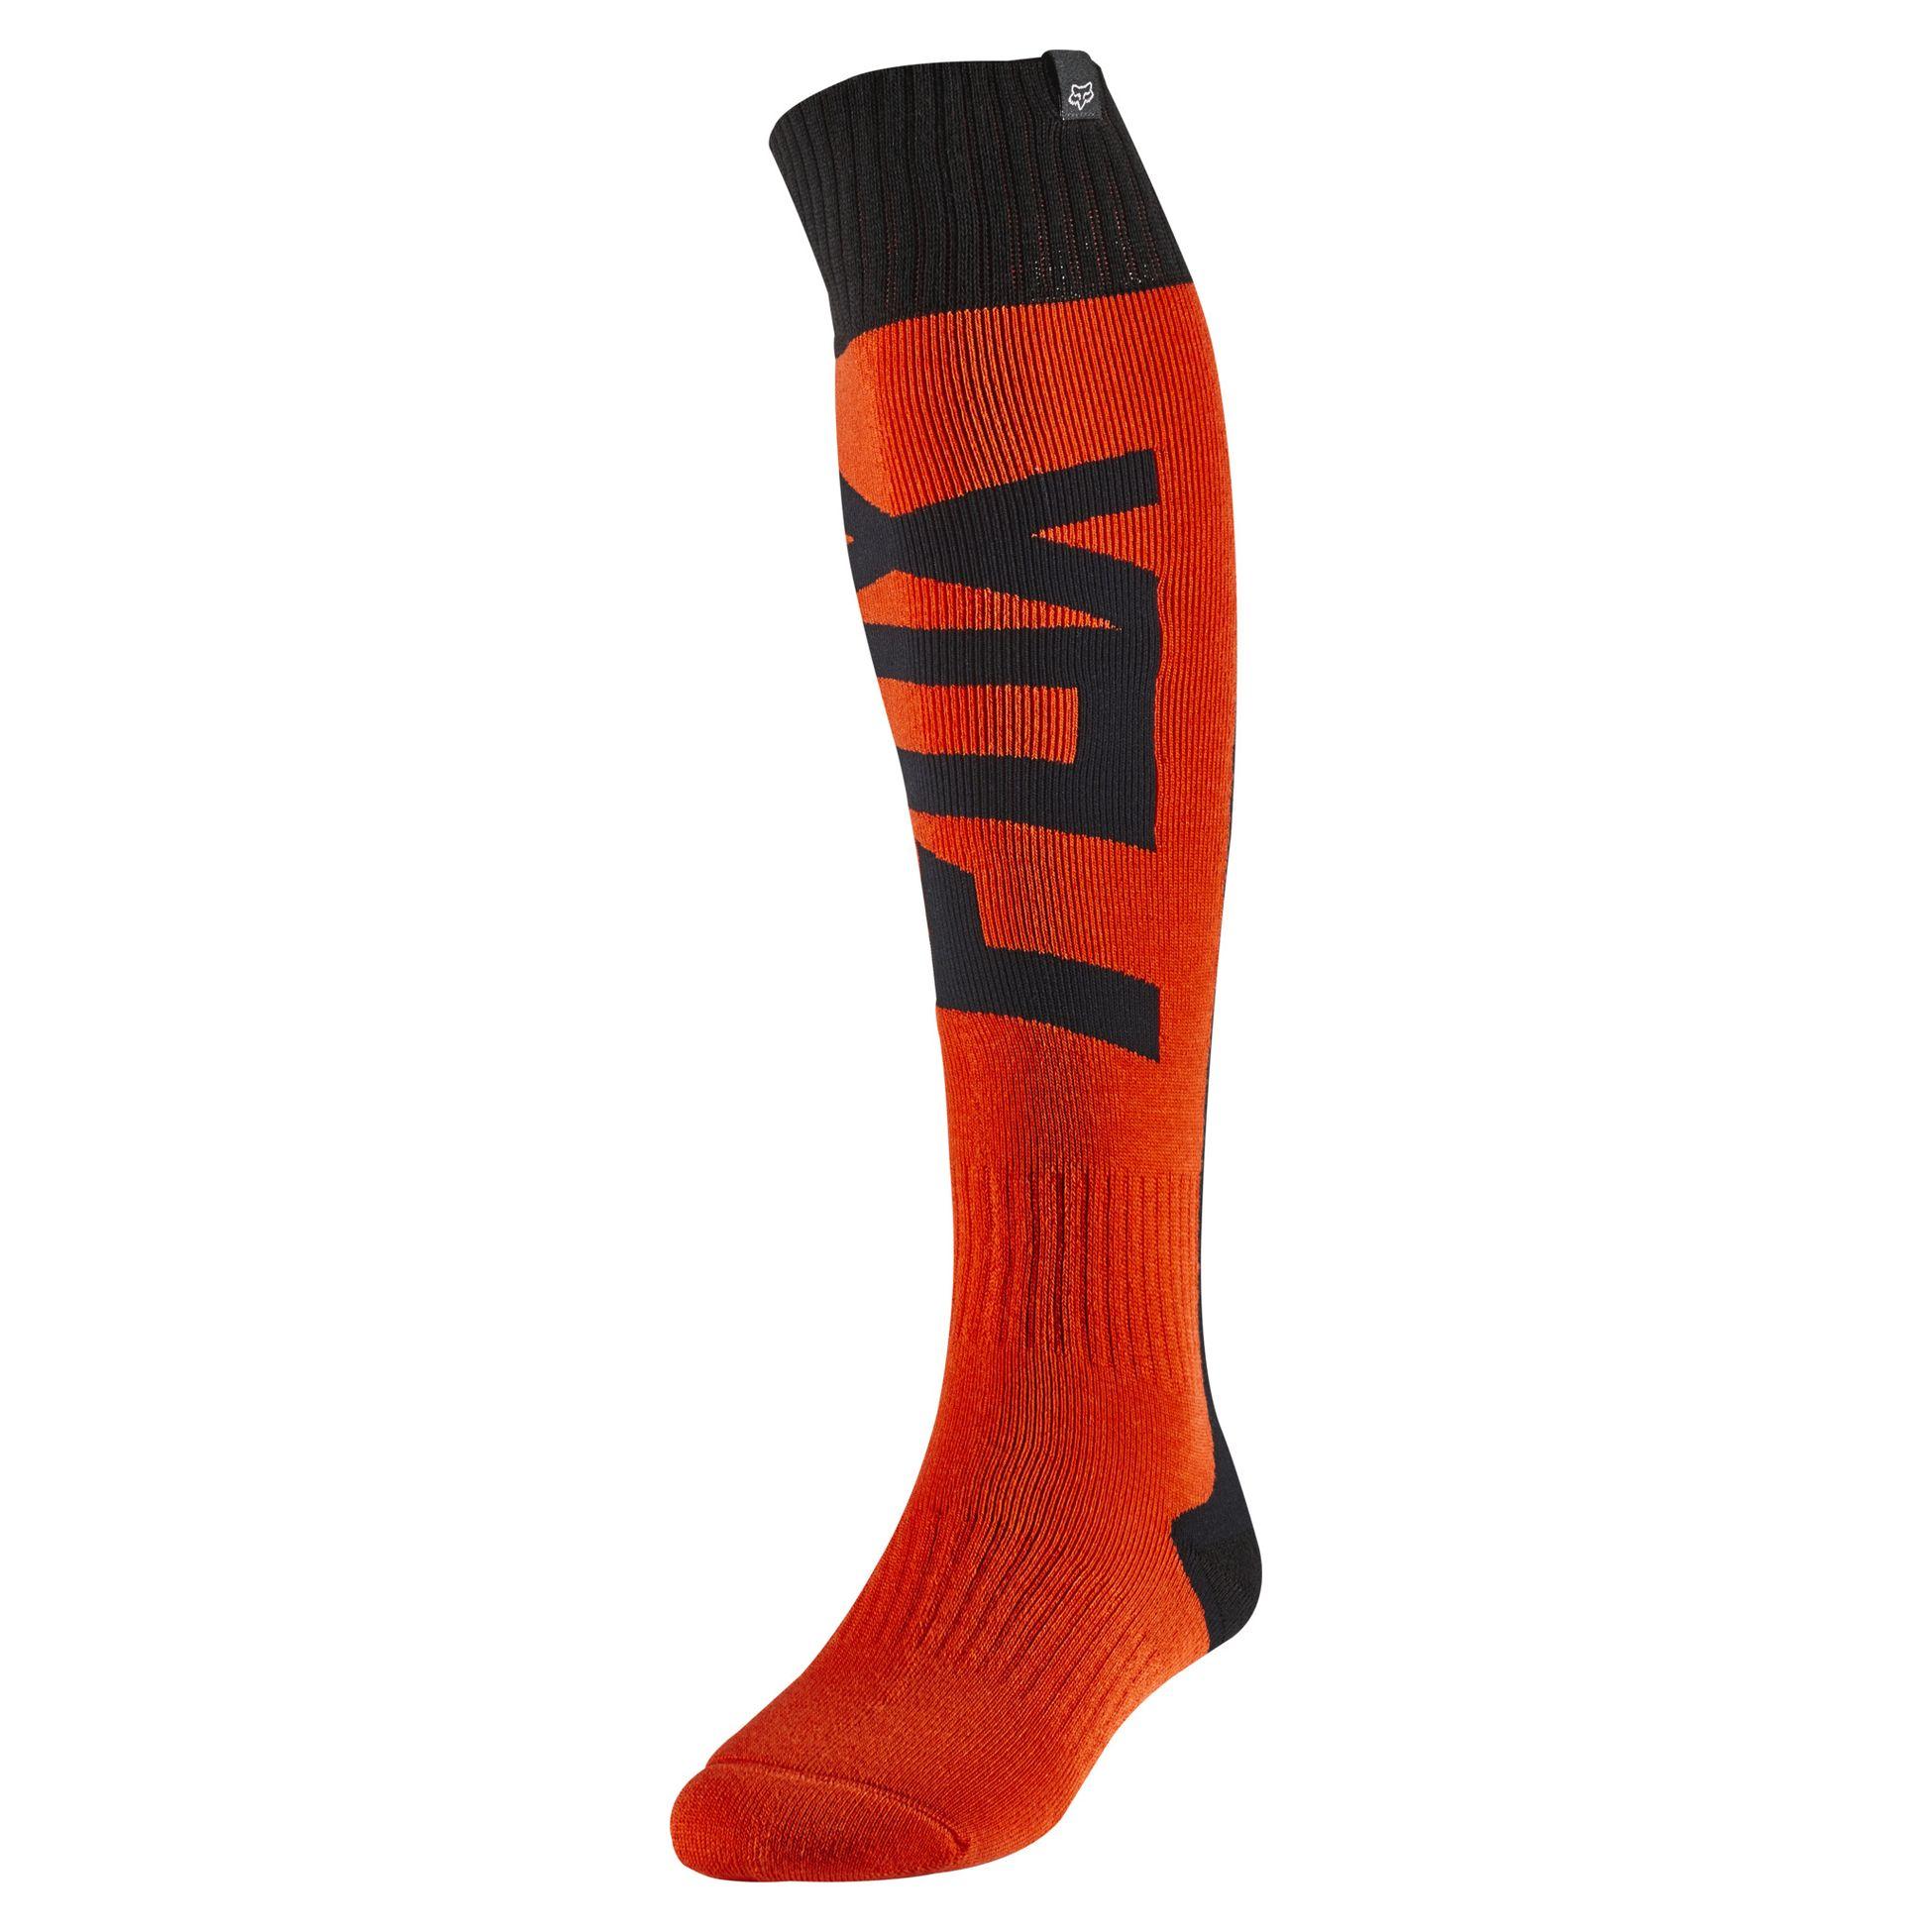 FLO Orange Small Fyce Fox Racing 2020 Youth Socks